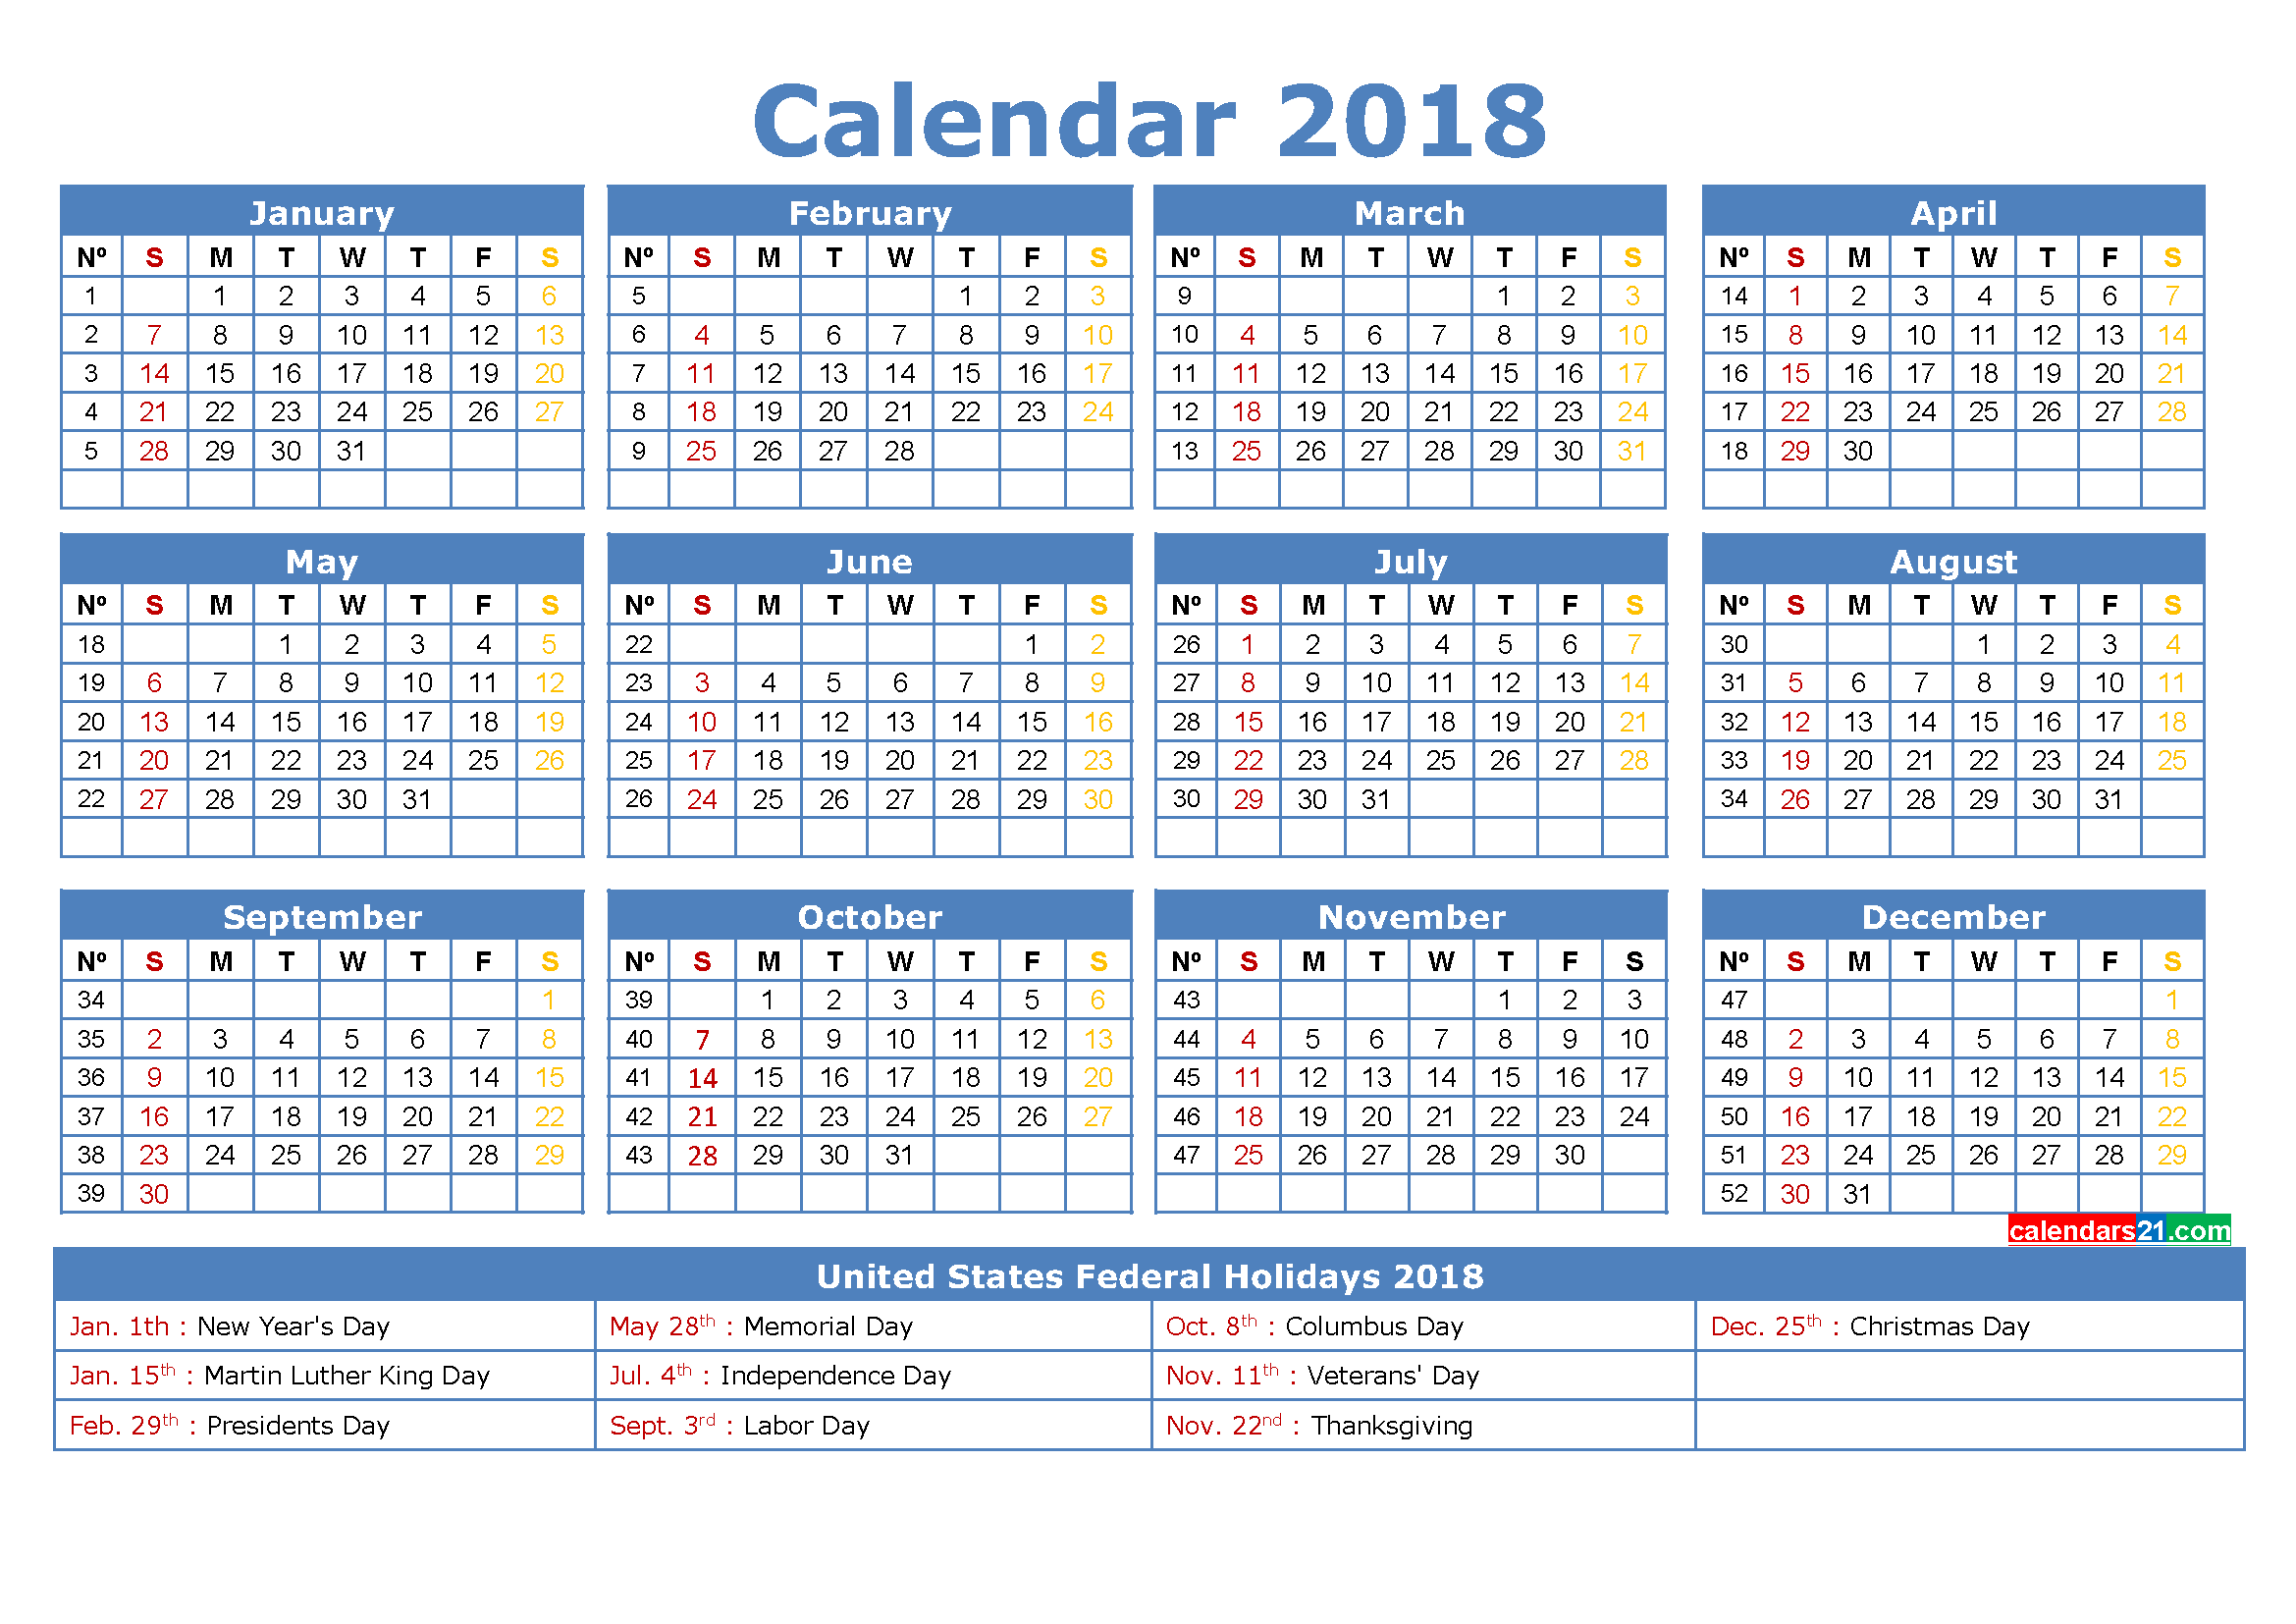 Calendar 2018 with Holidays Printable Calendar Template, Steel